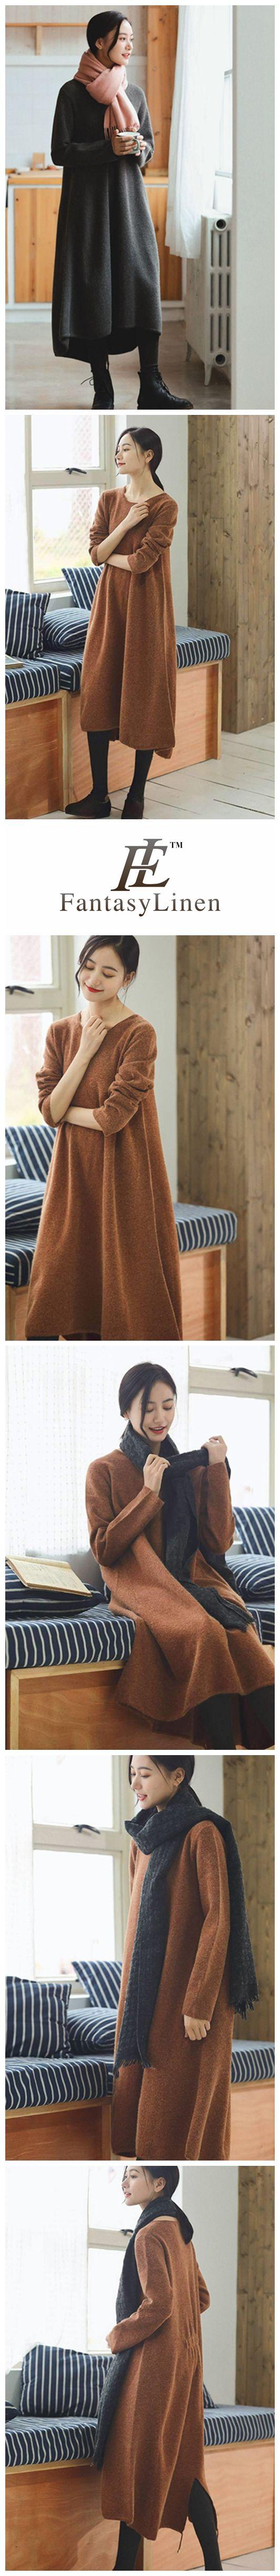 Orange Maxi Loose Wool Knitted Long Sweater Dress in Autumn/Winter Q2731 Q2731Orange